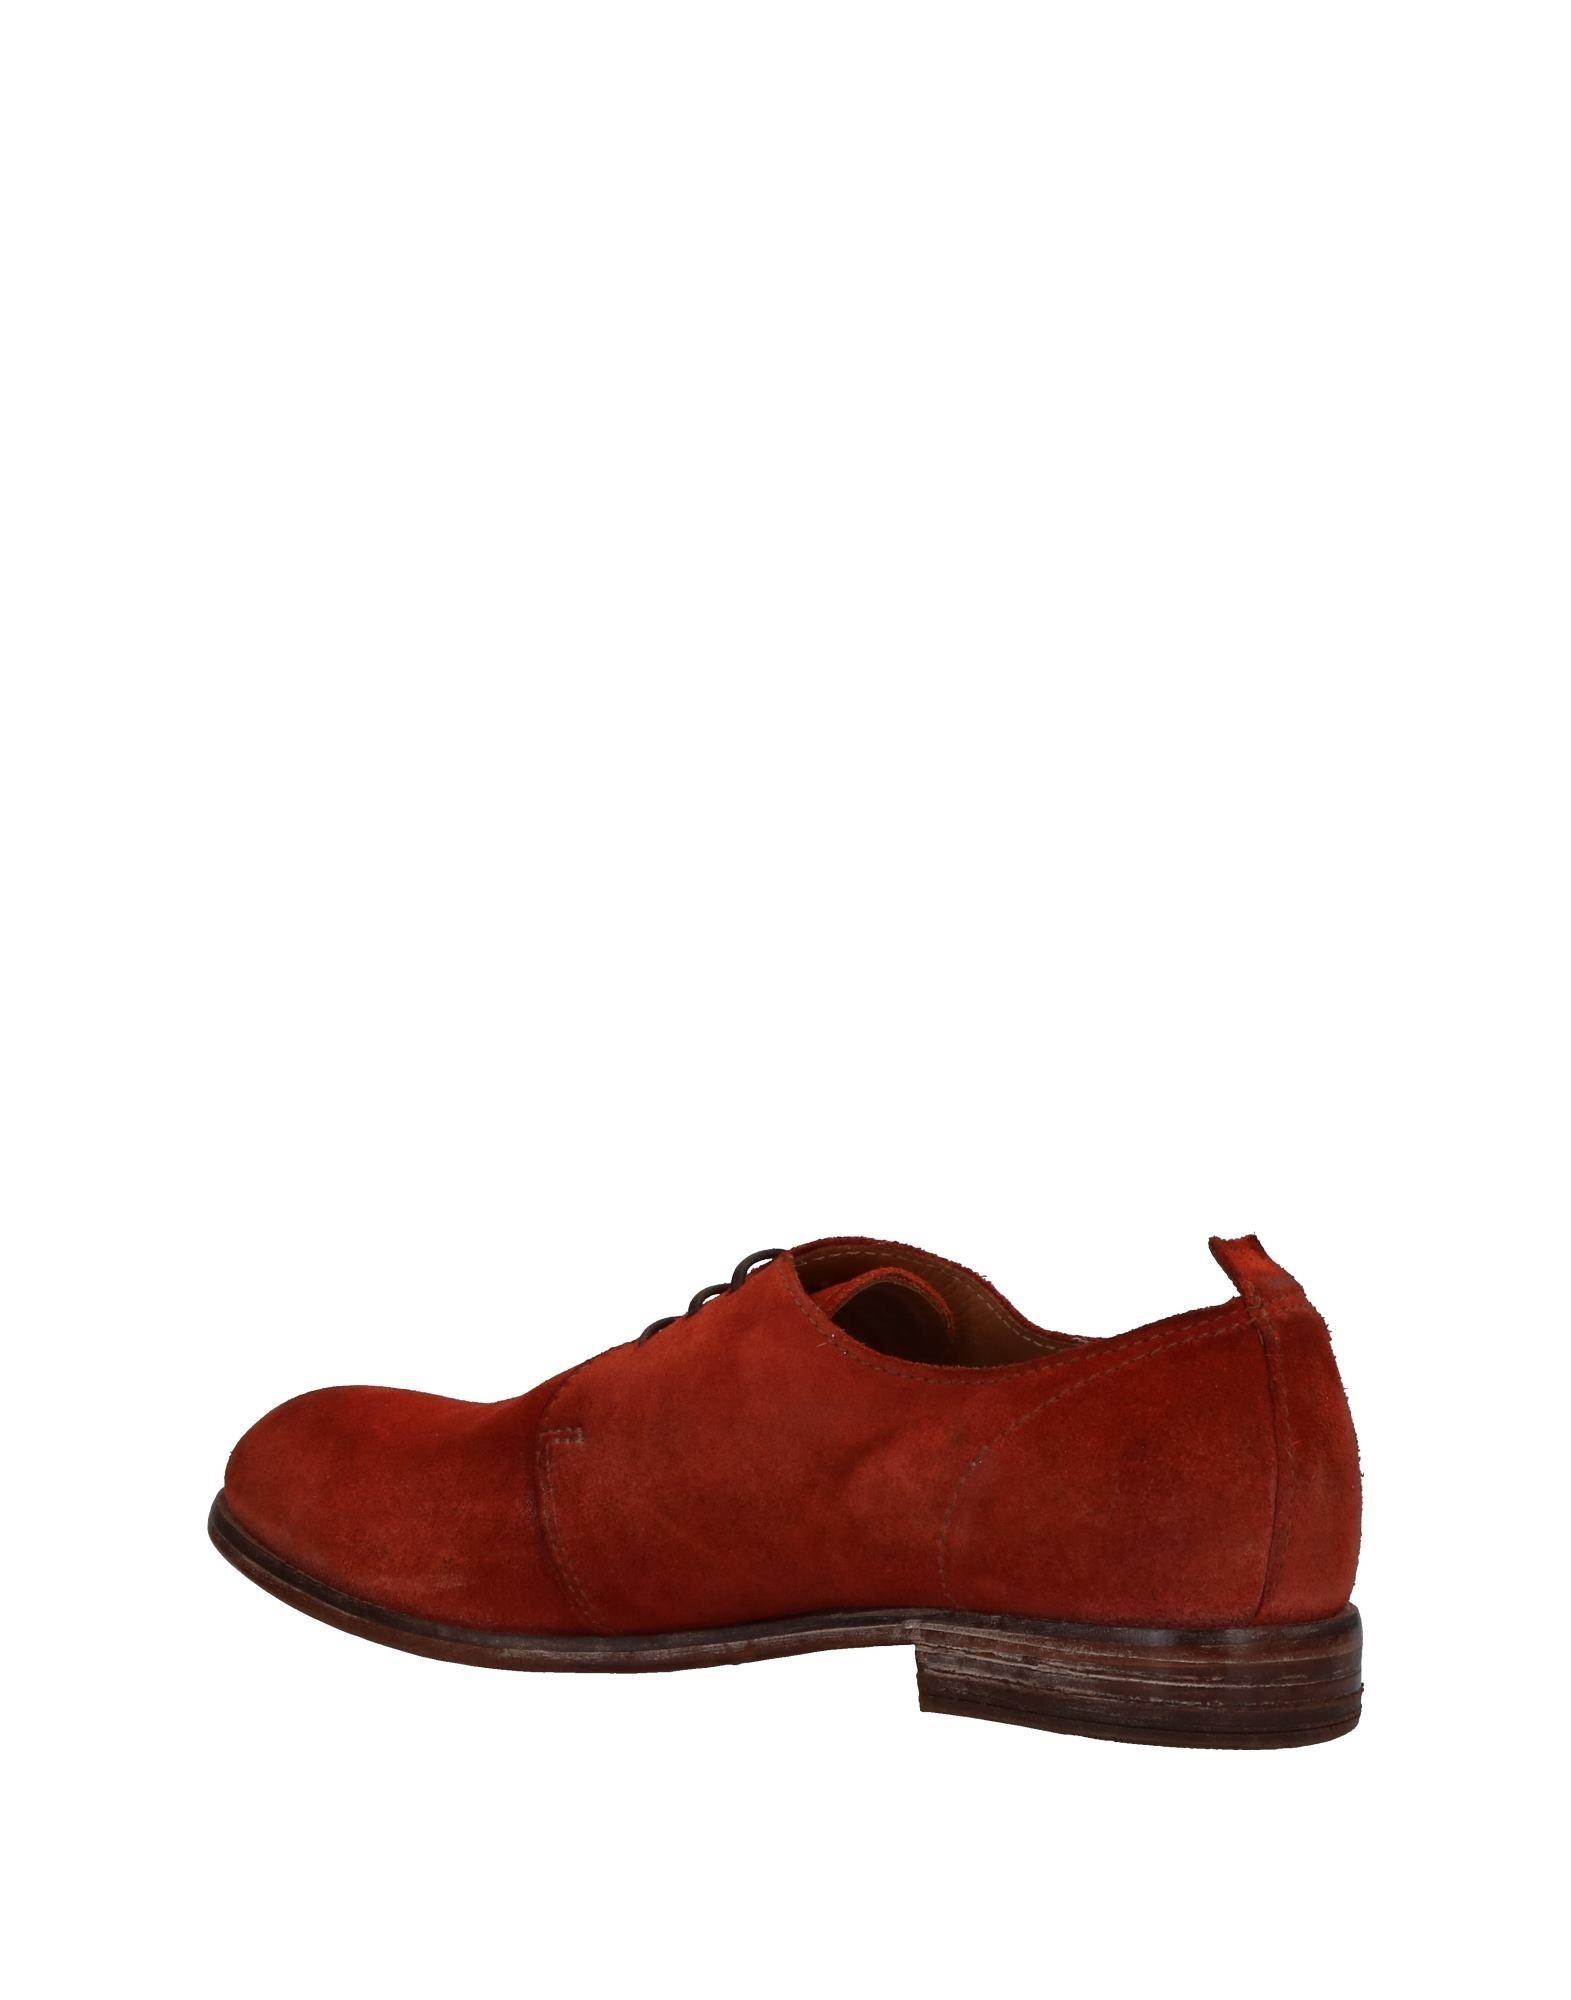 Moma Schnürschuhe Schuhe Damen  11411865EV Heiße Schuhe Schnürschuhe fda876